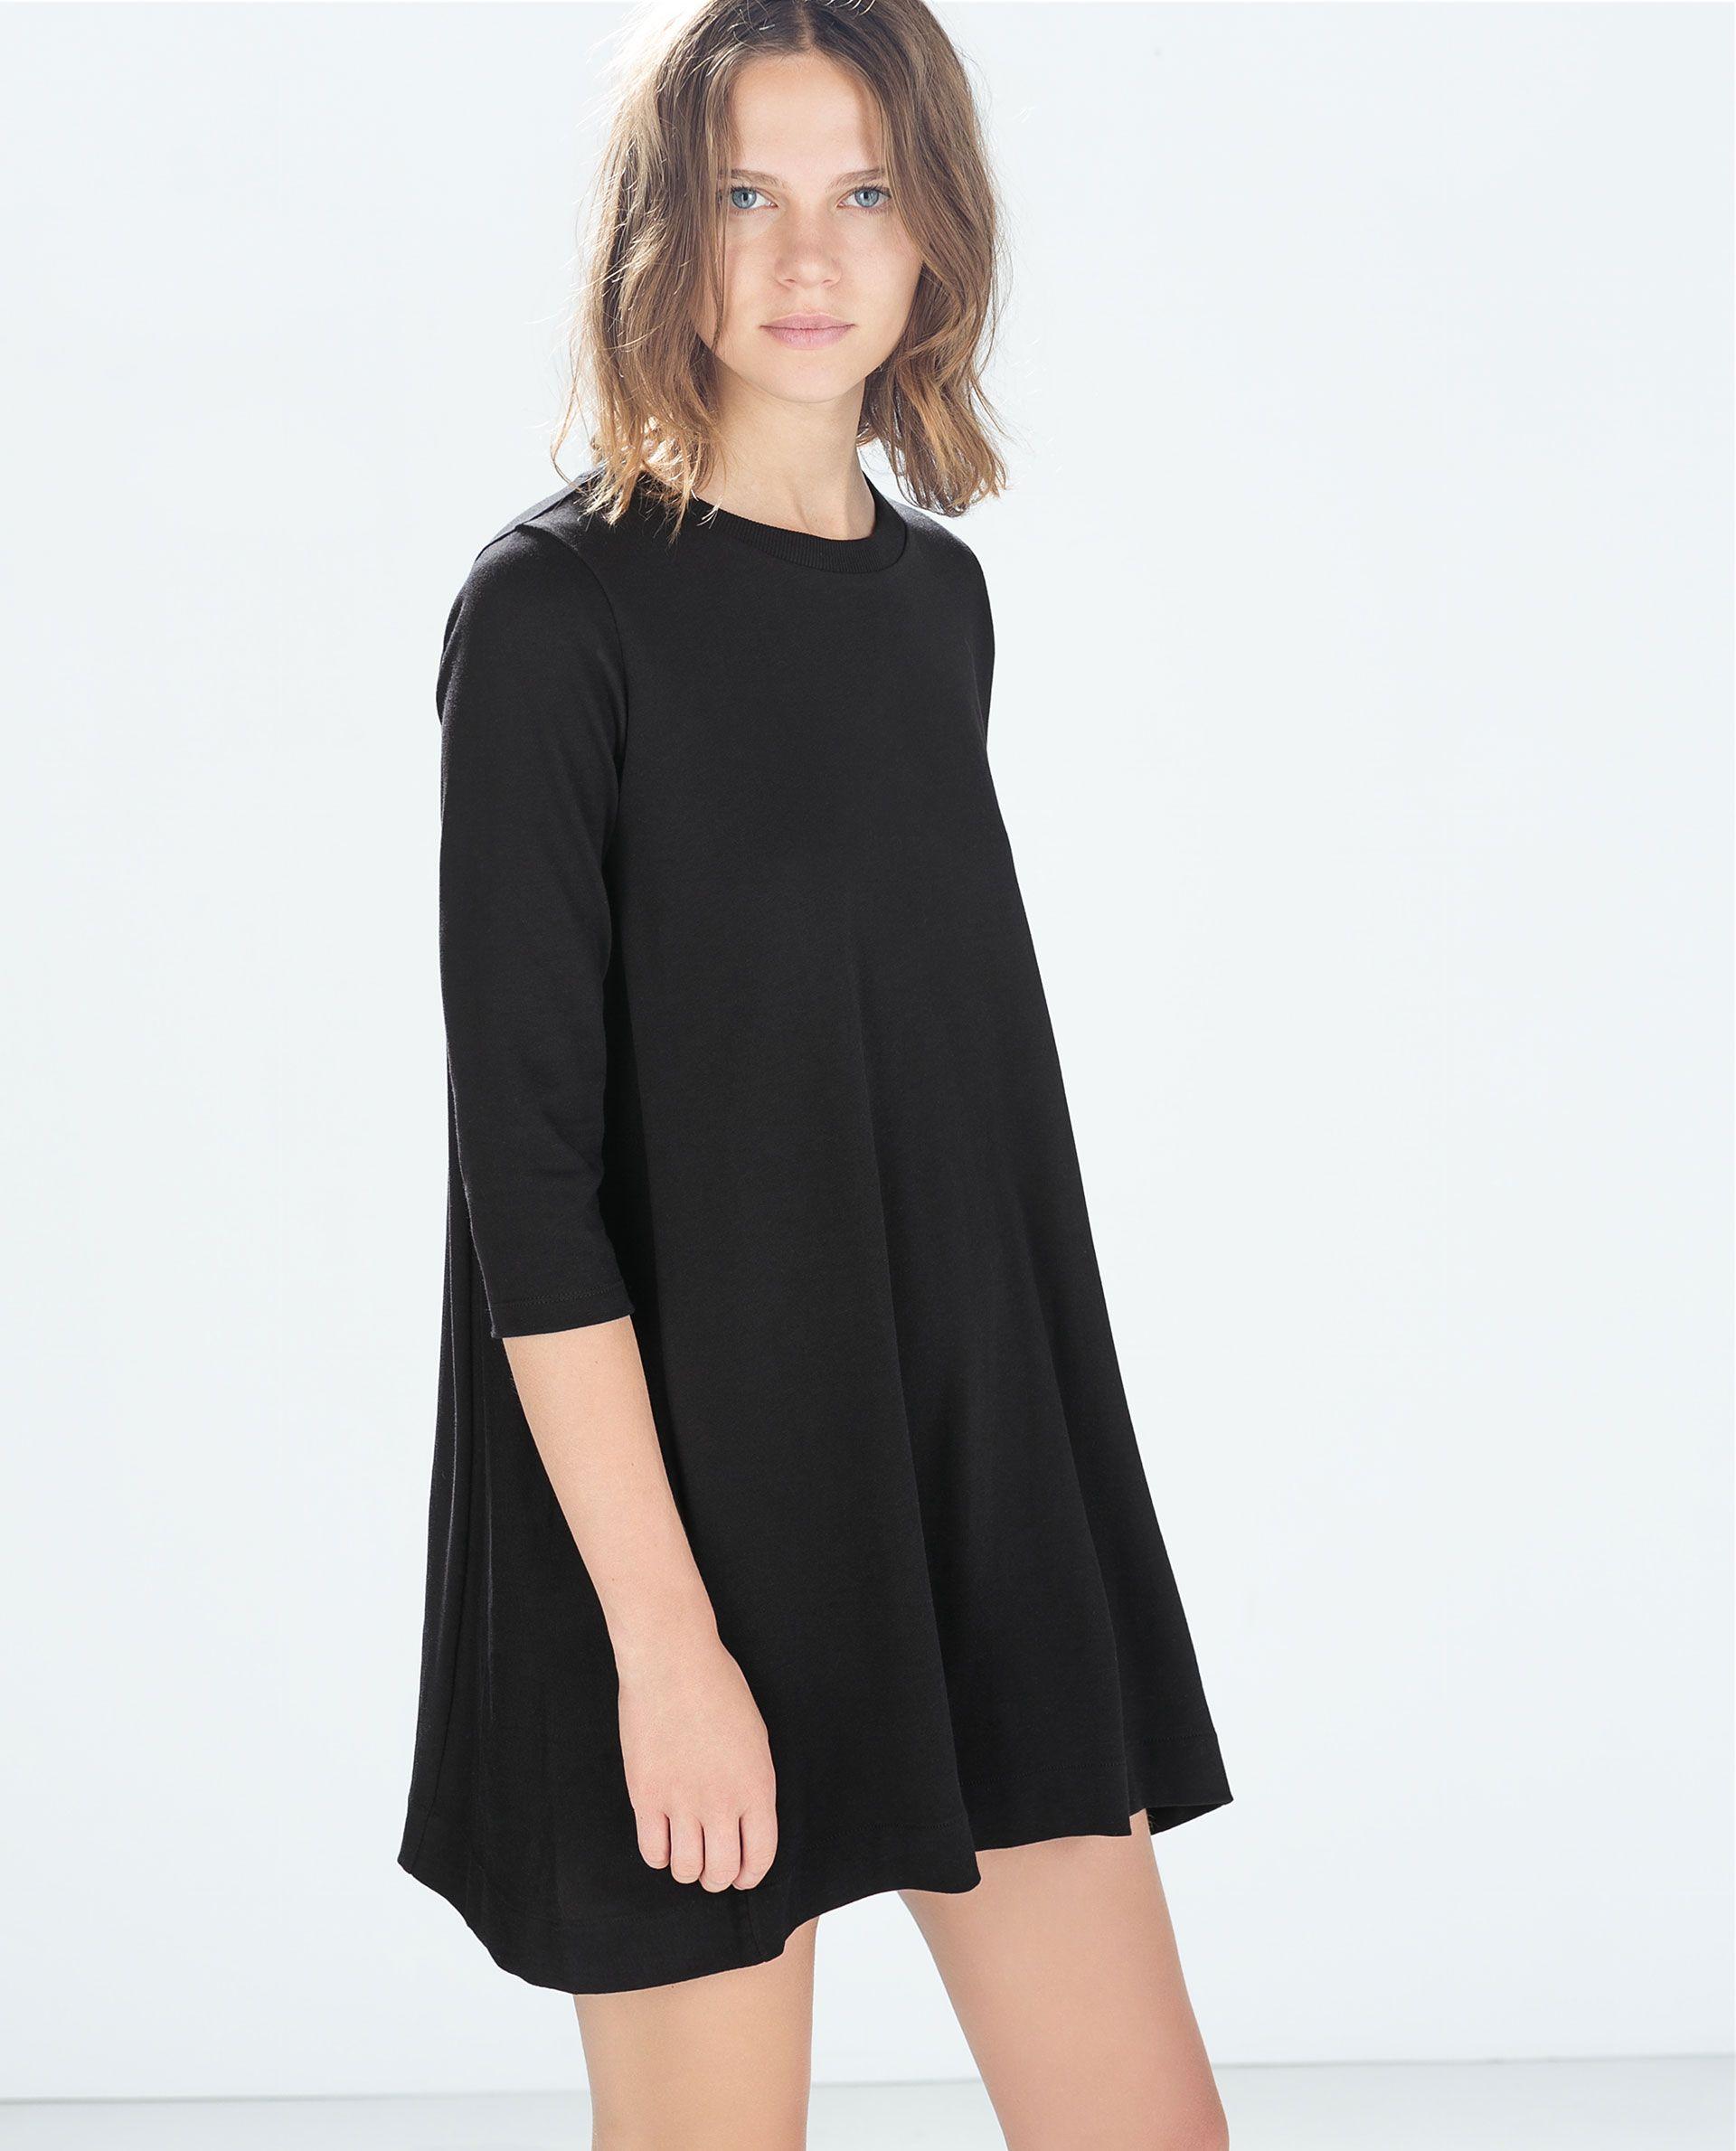 Zara vestidos mujer trf